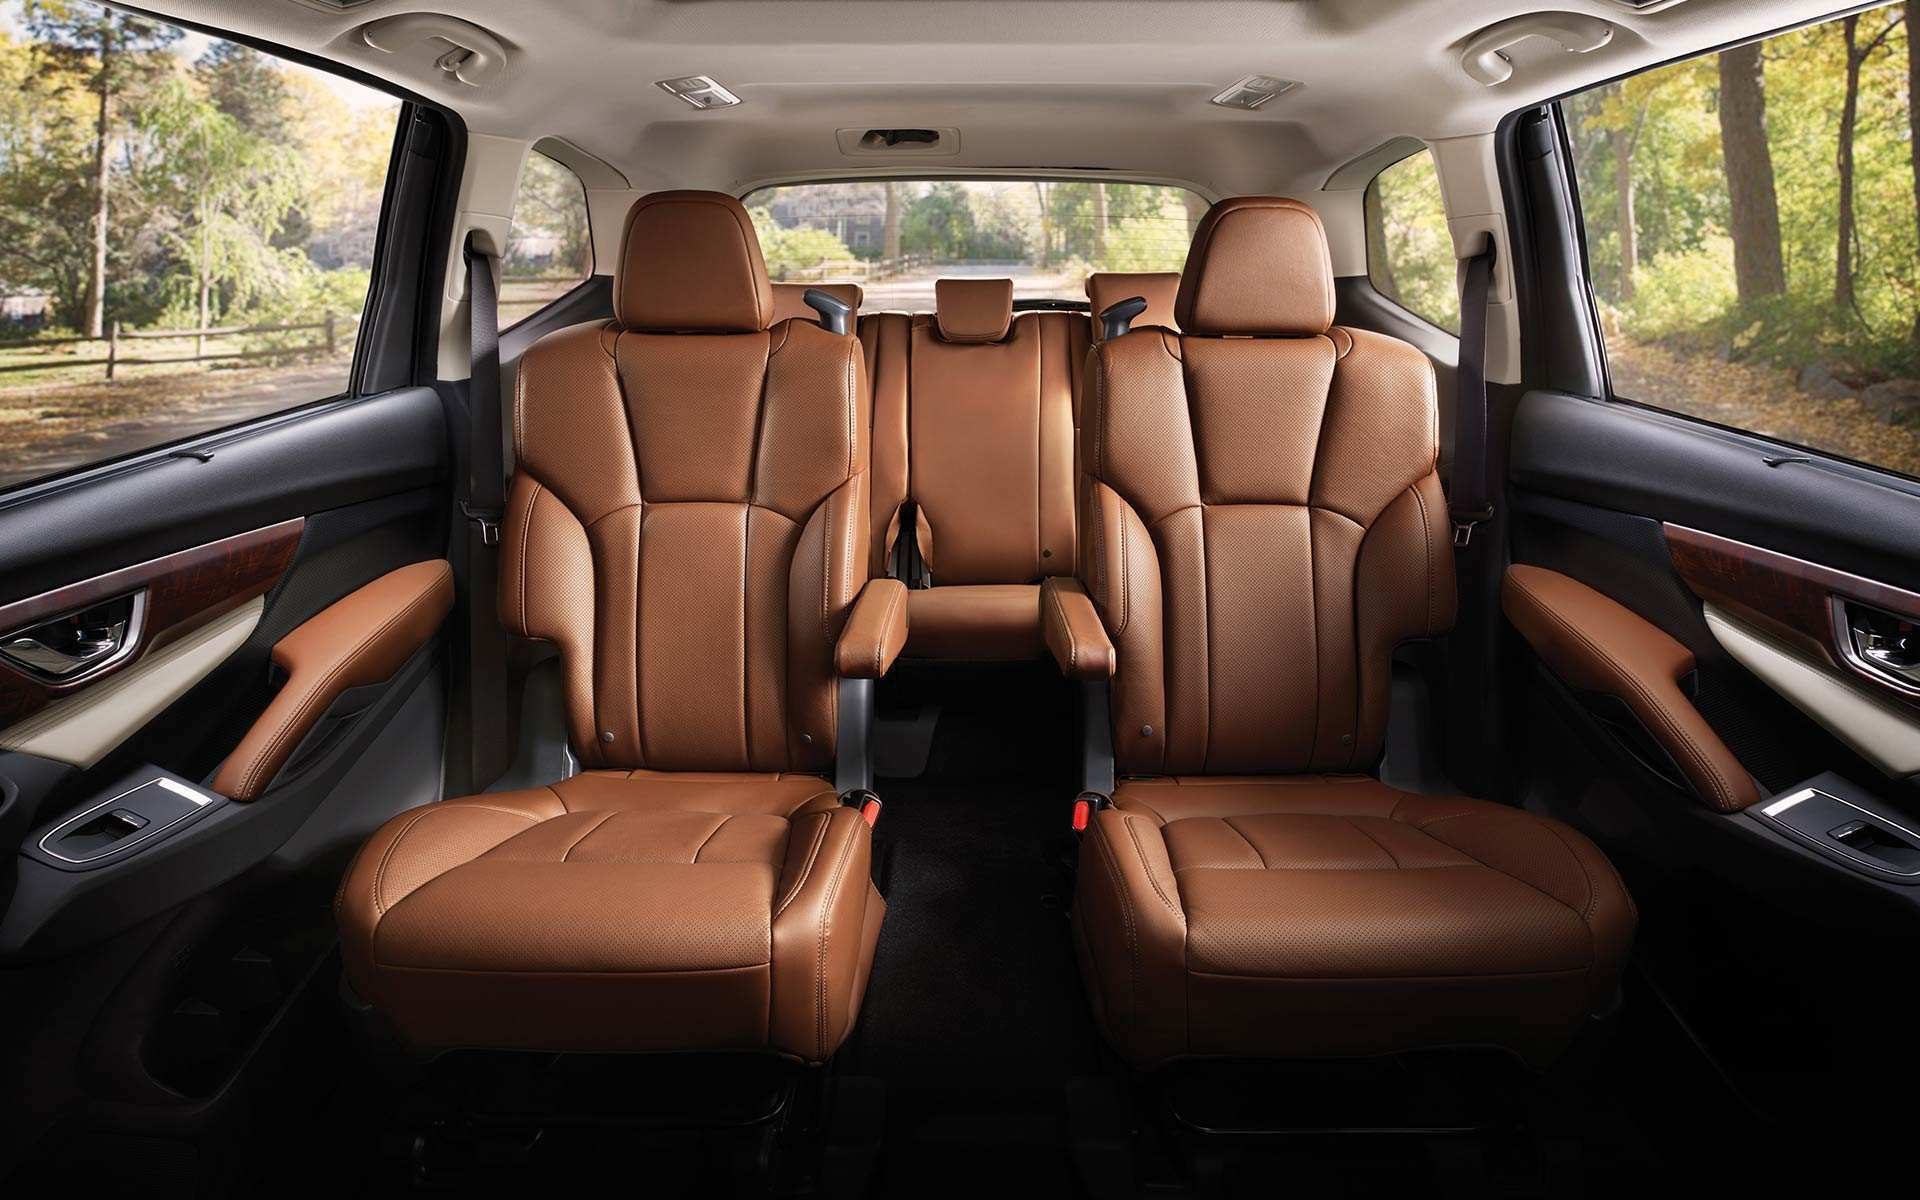 22 Gallery of 2019 Subaru Ascent Fuel Economy Concept for 2019 Subaru Ascent Fuel Economy